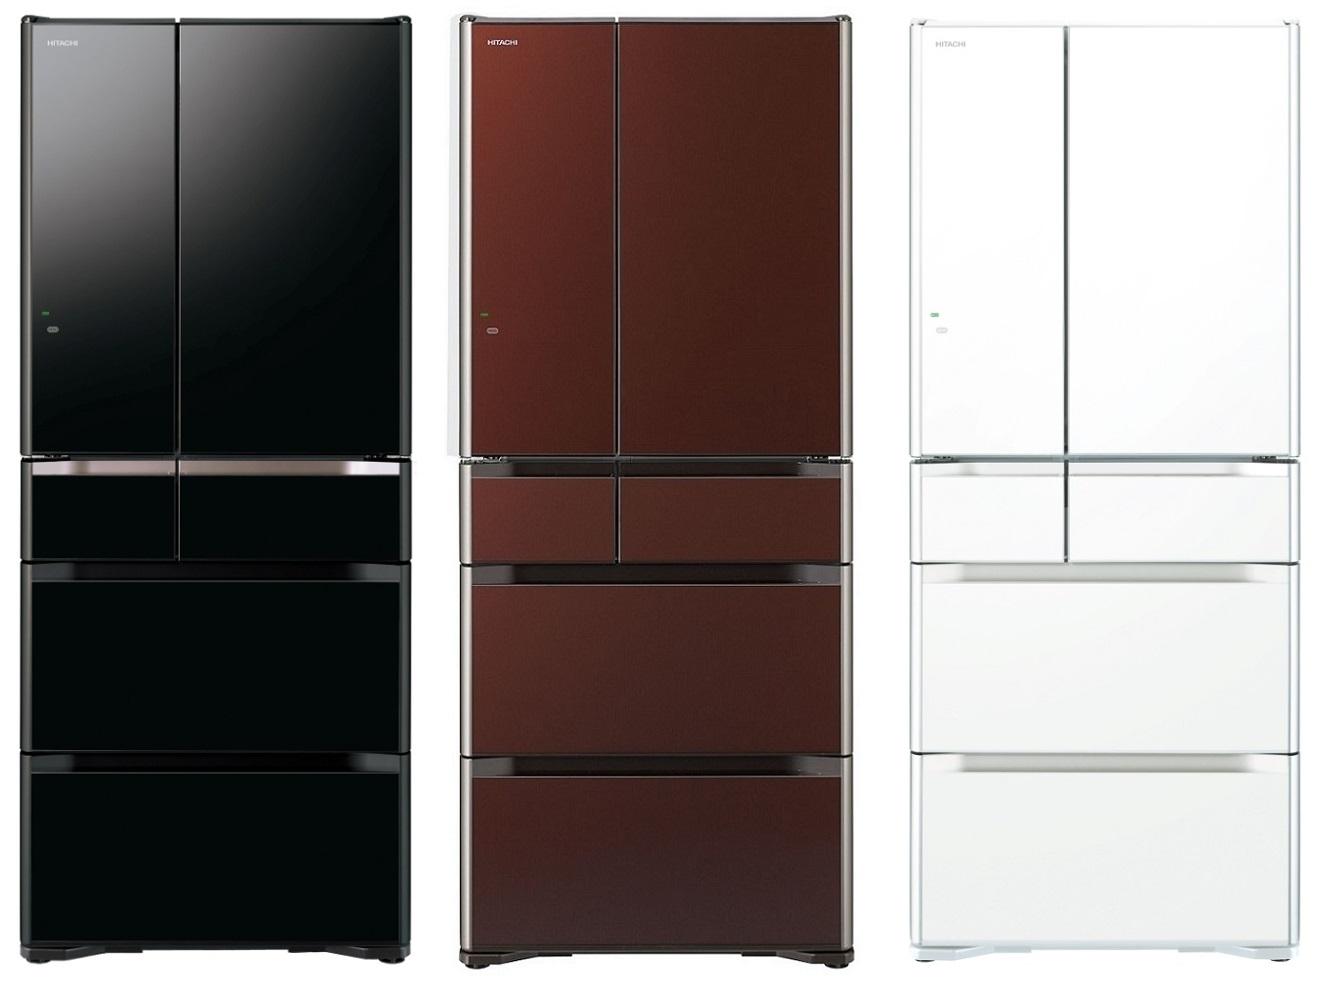 HITACHI 日立 RG620FJ 日本原裝六門琉璃冰箱(620L) ★指定區域配送安裝★